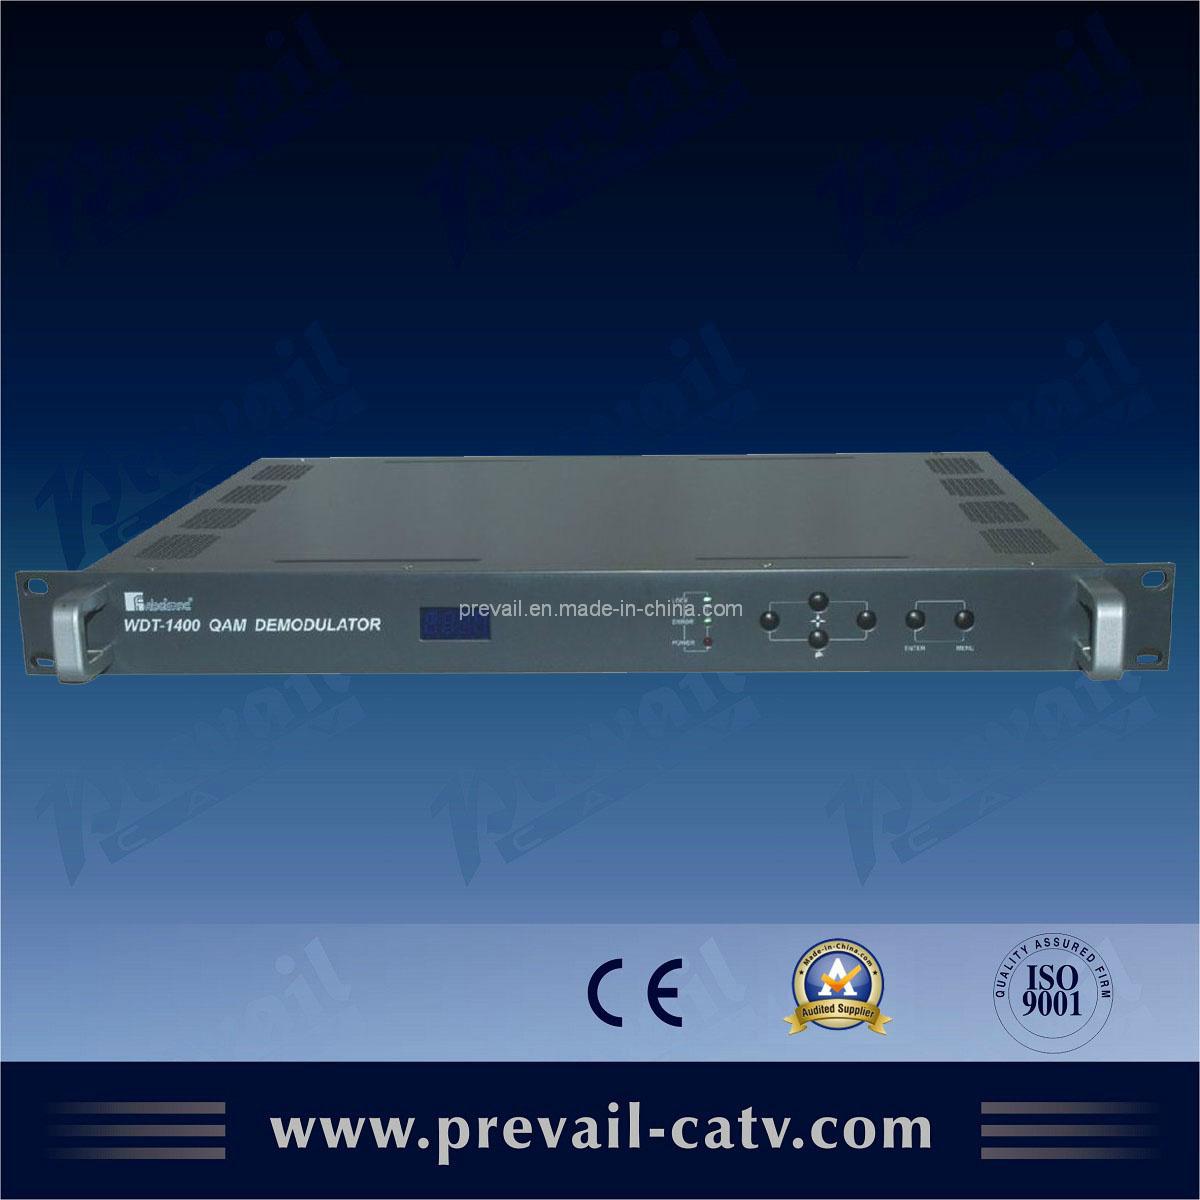 QAM Demodulator (WDT-1400)